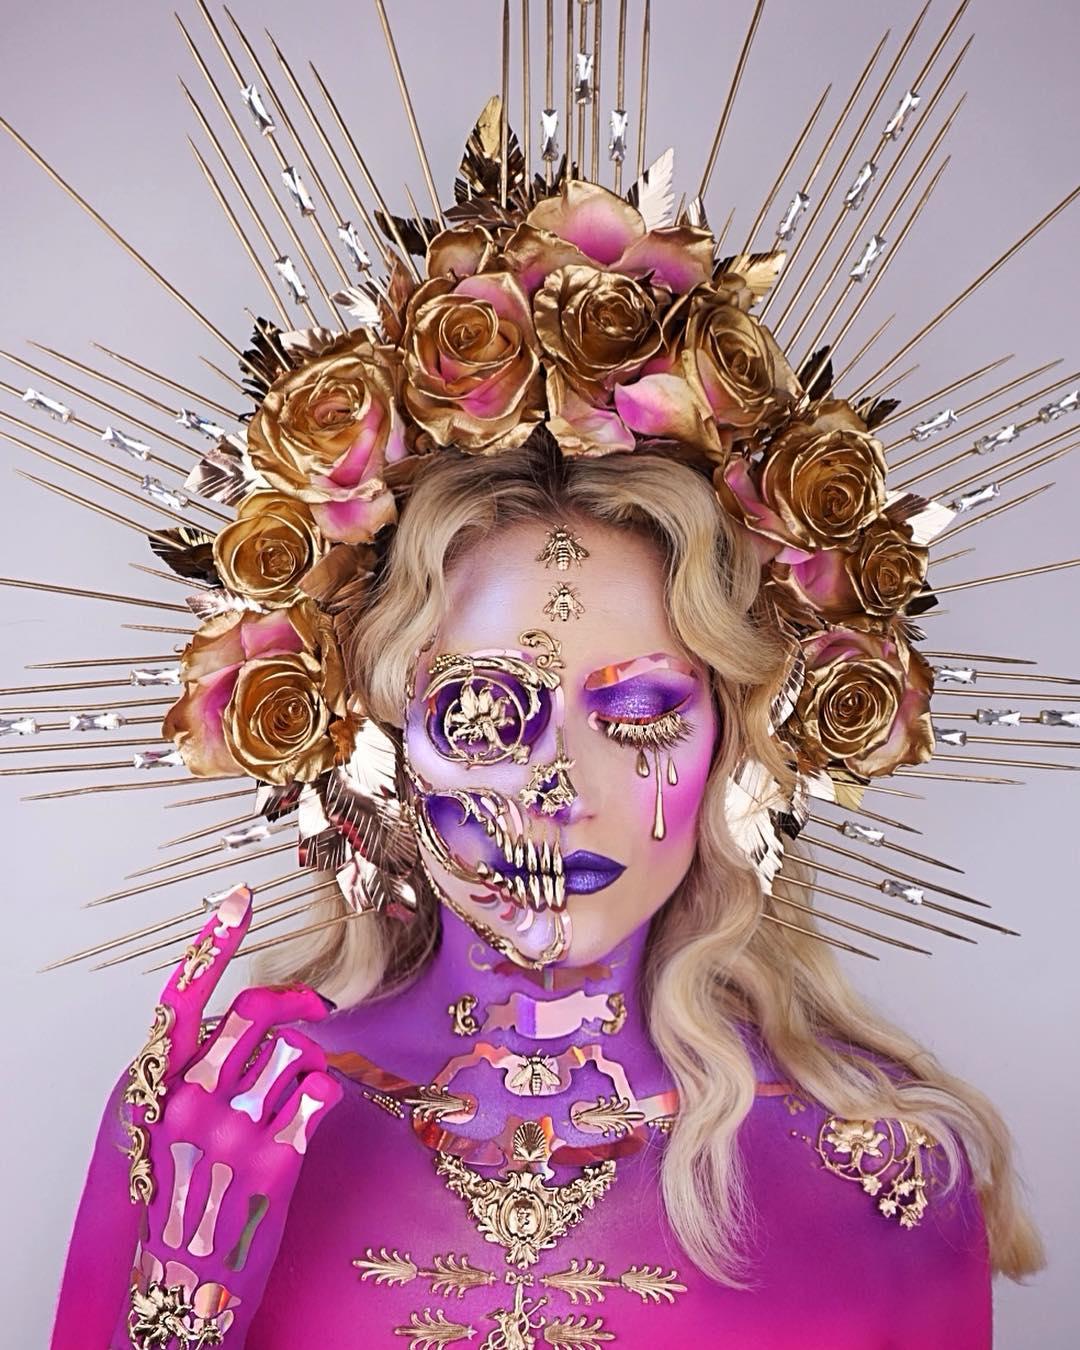 Лучшие идеи макияжа на Хэллоуин